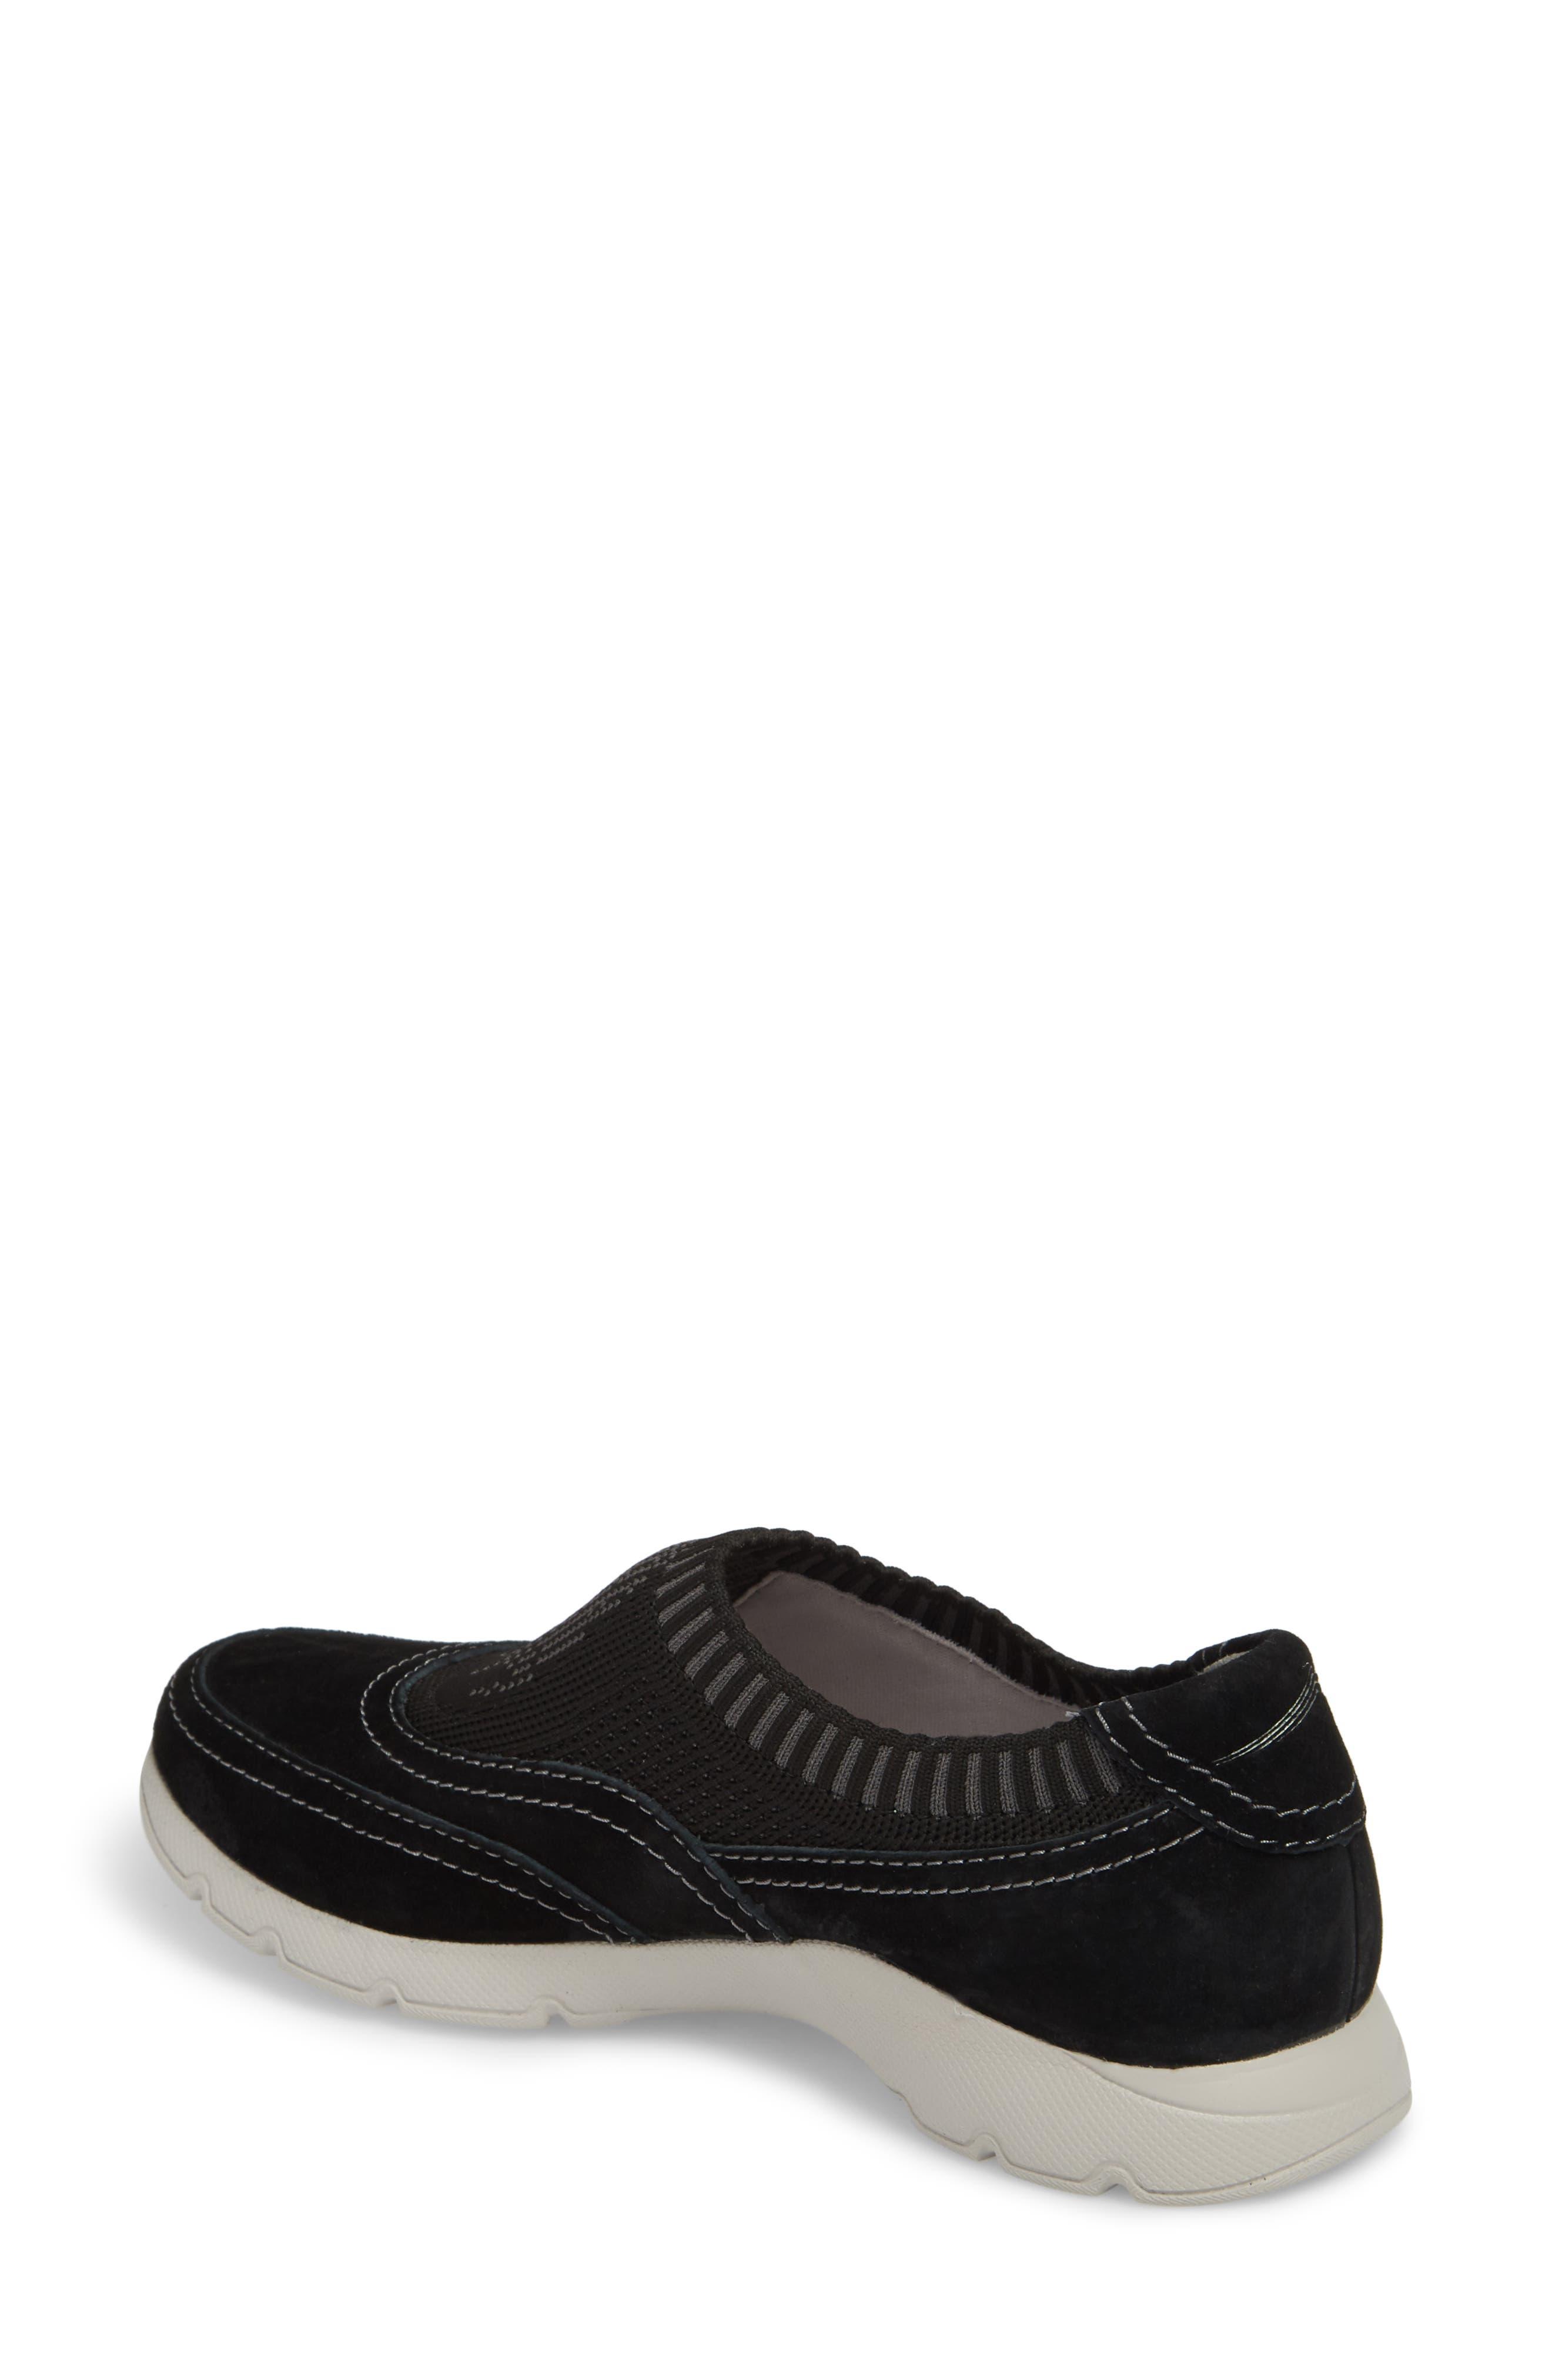 Alice Slip-On Sneaker,                             Alternate thumbnail 2, color,                             Black Suede